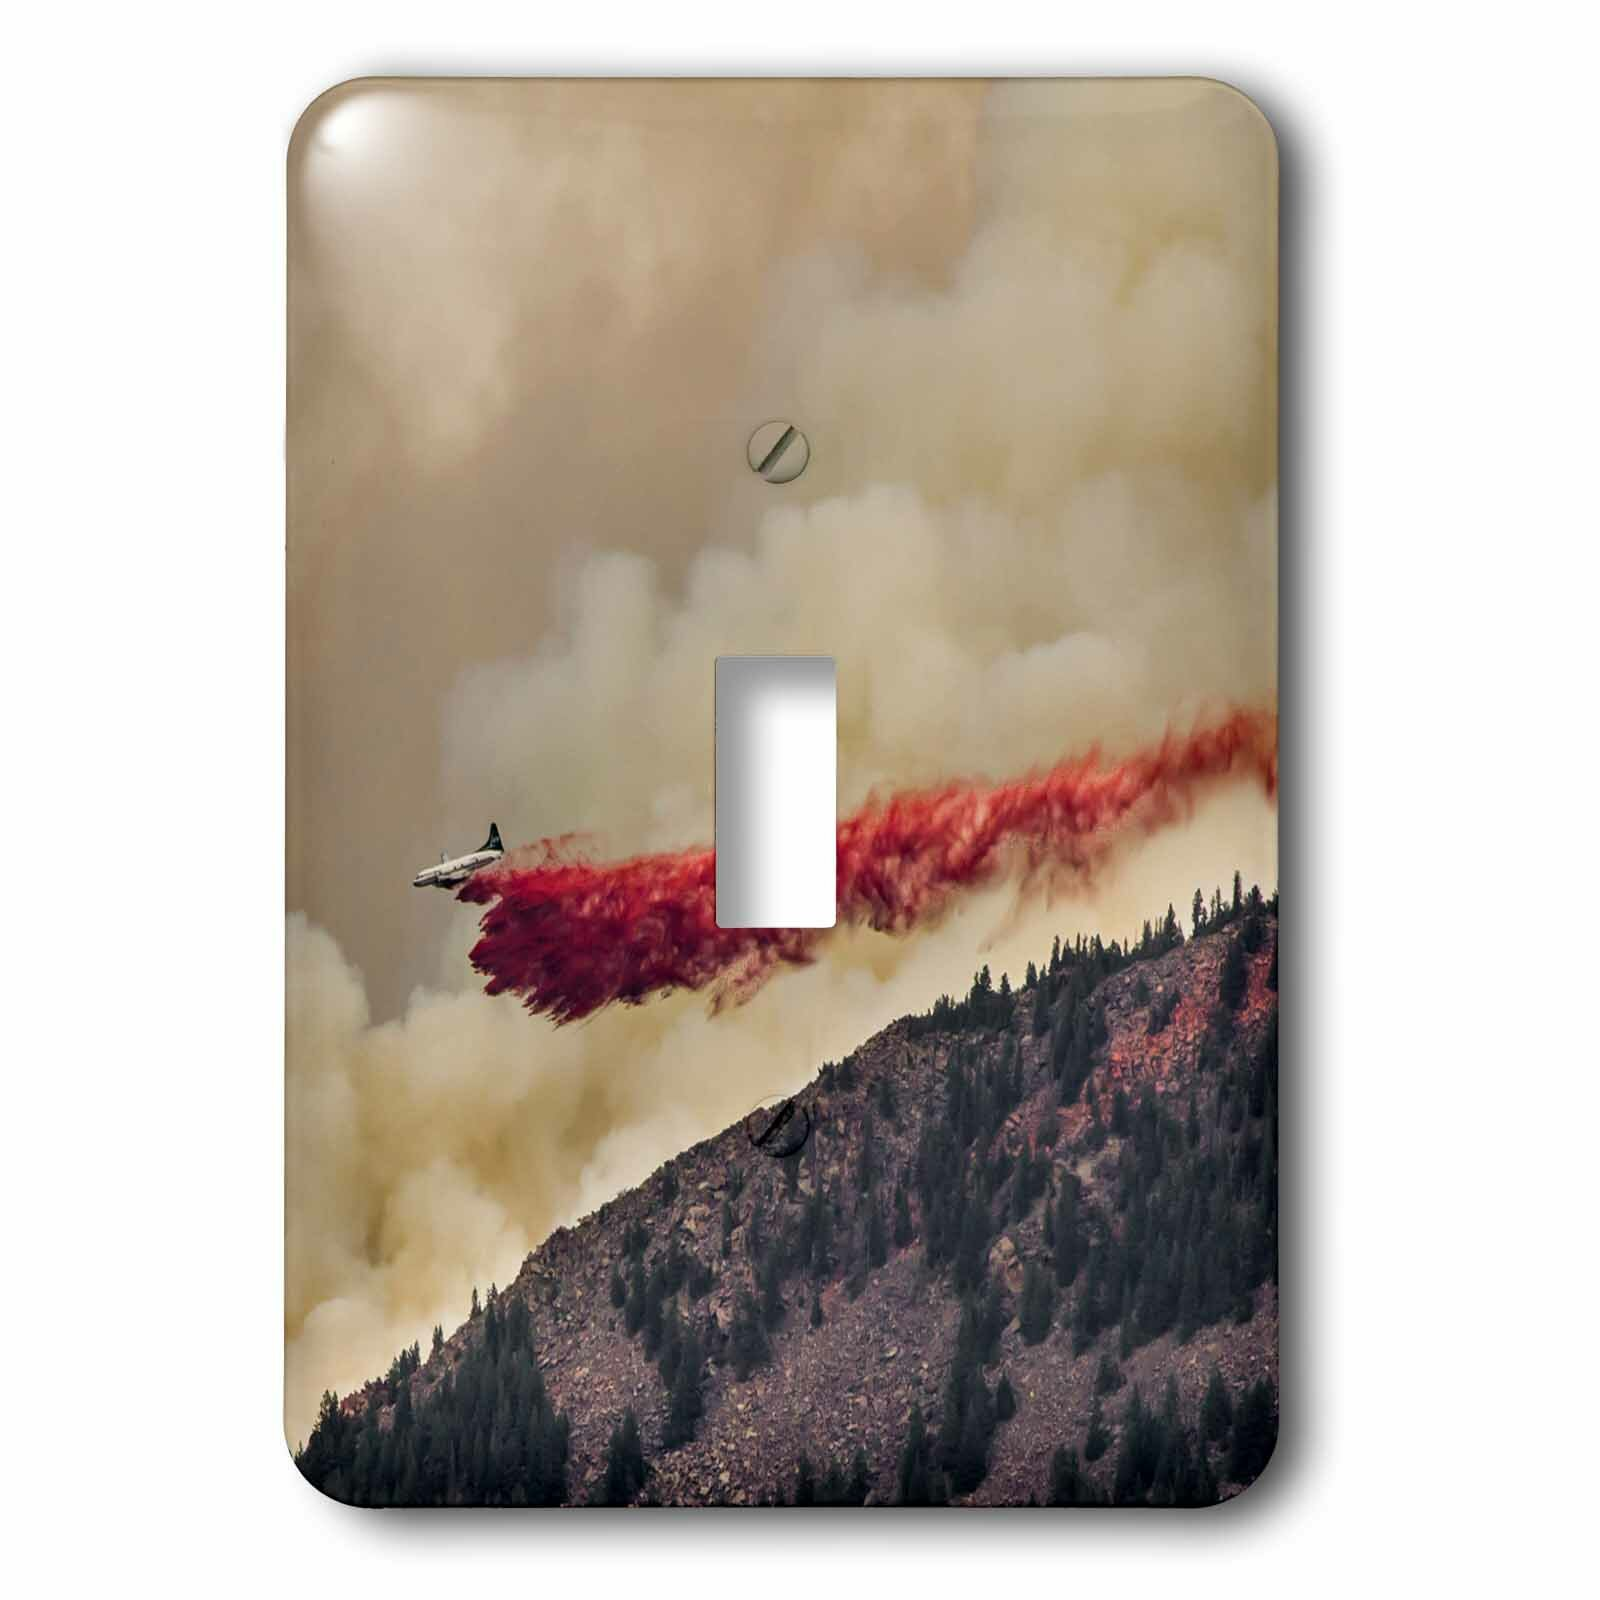 3drose Dropping Fire Retardant 1 Gang Toggle Light Switch Wall Plate Wayfair